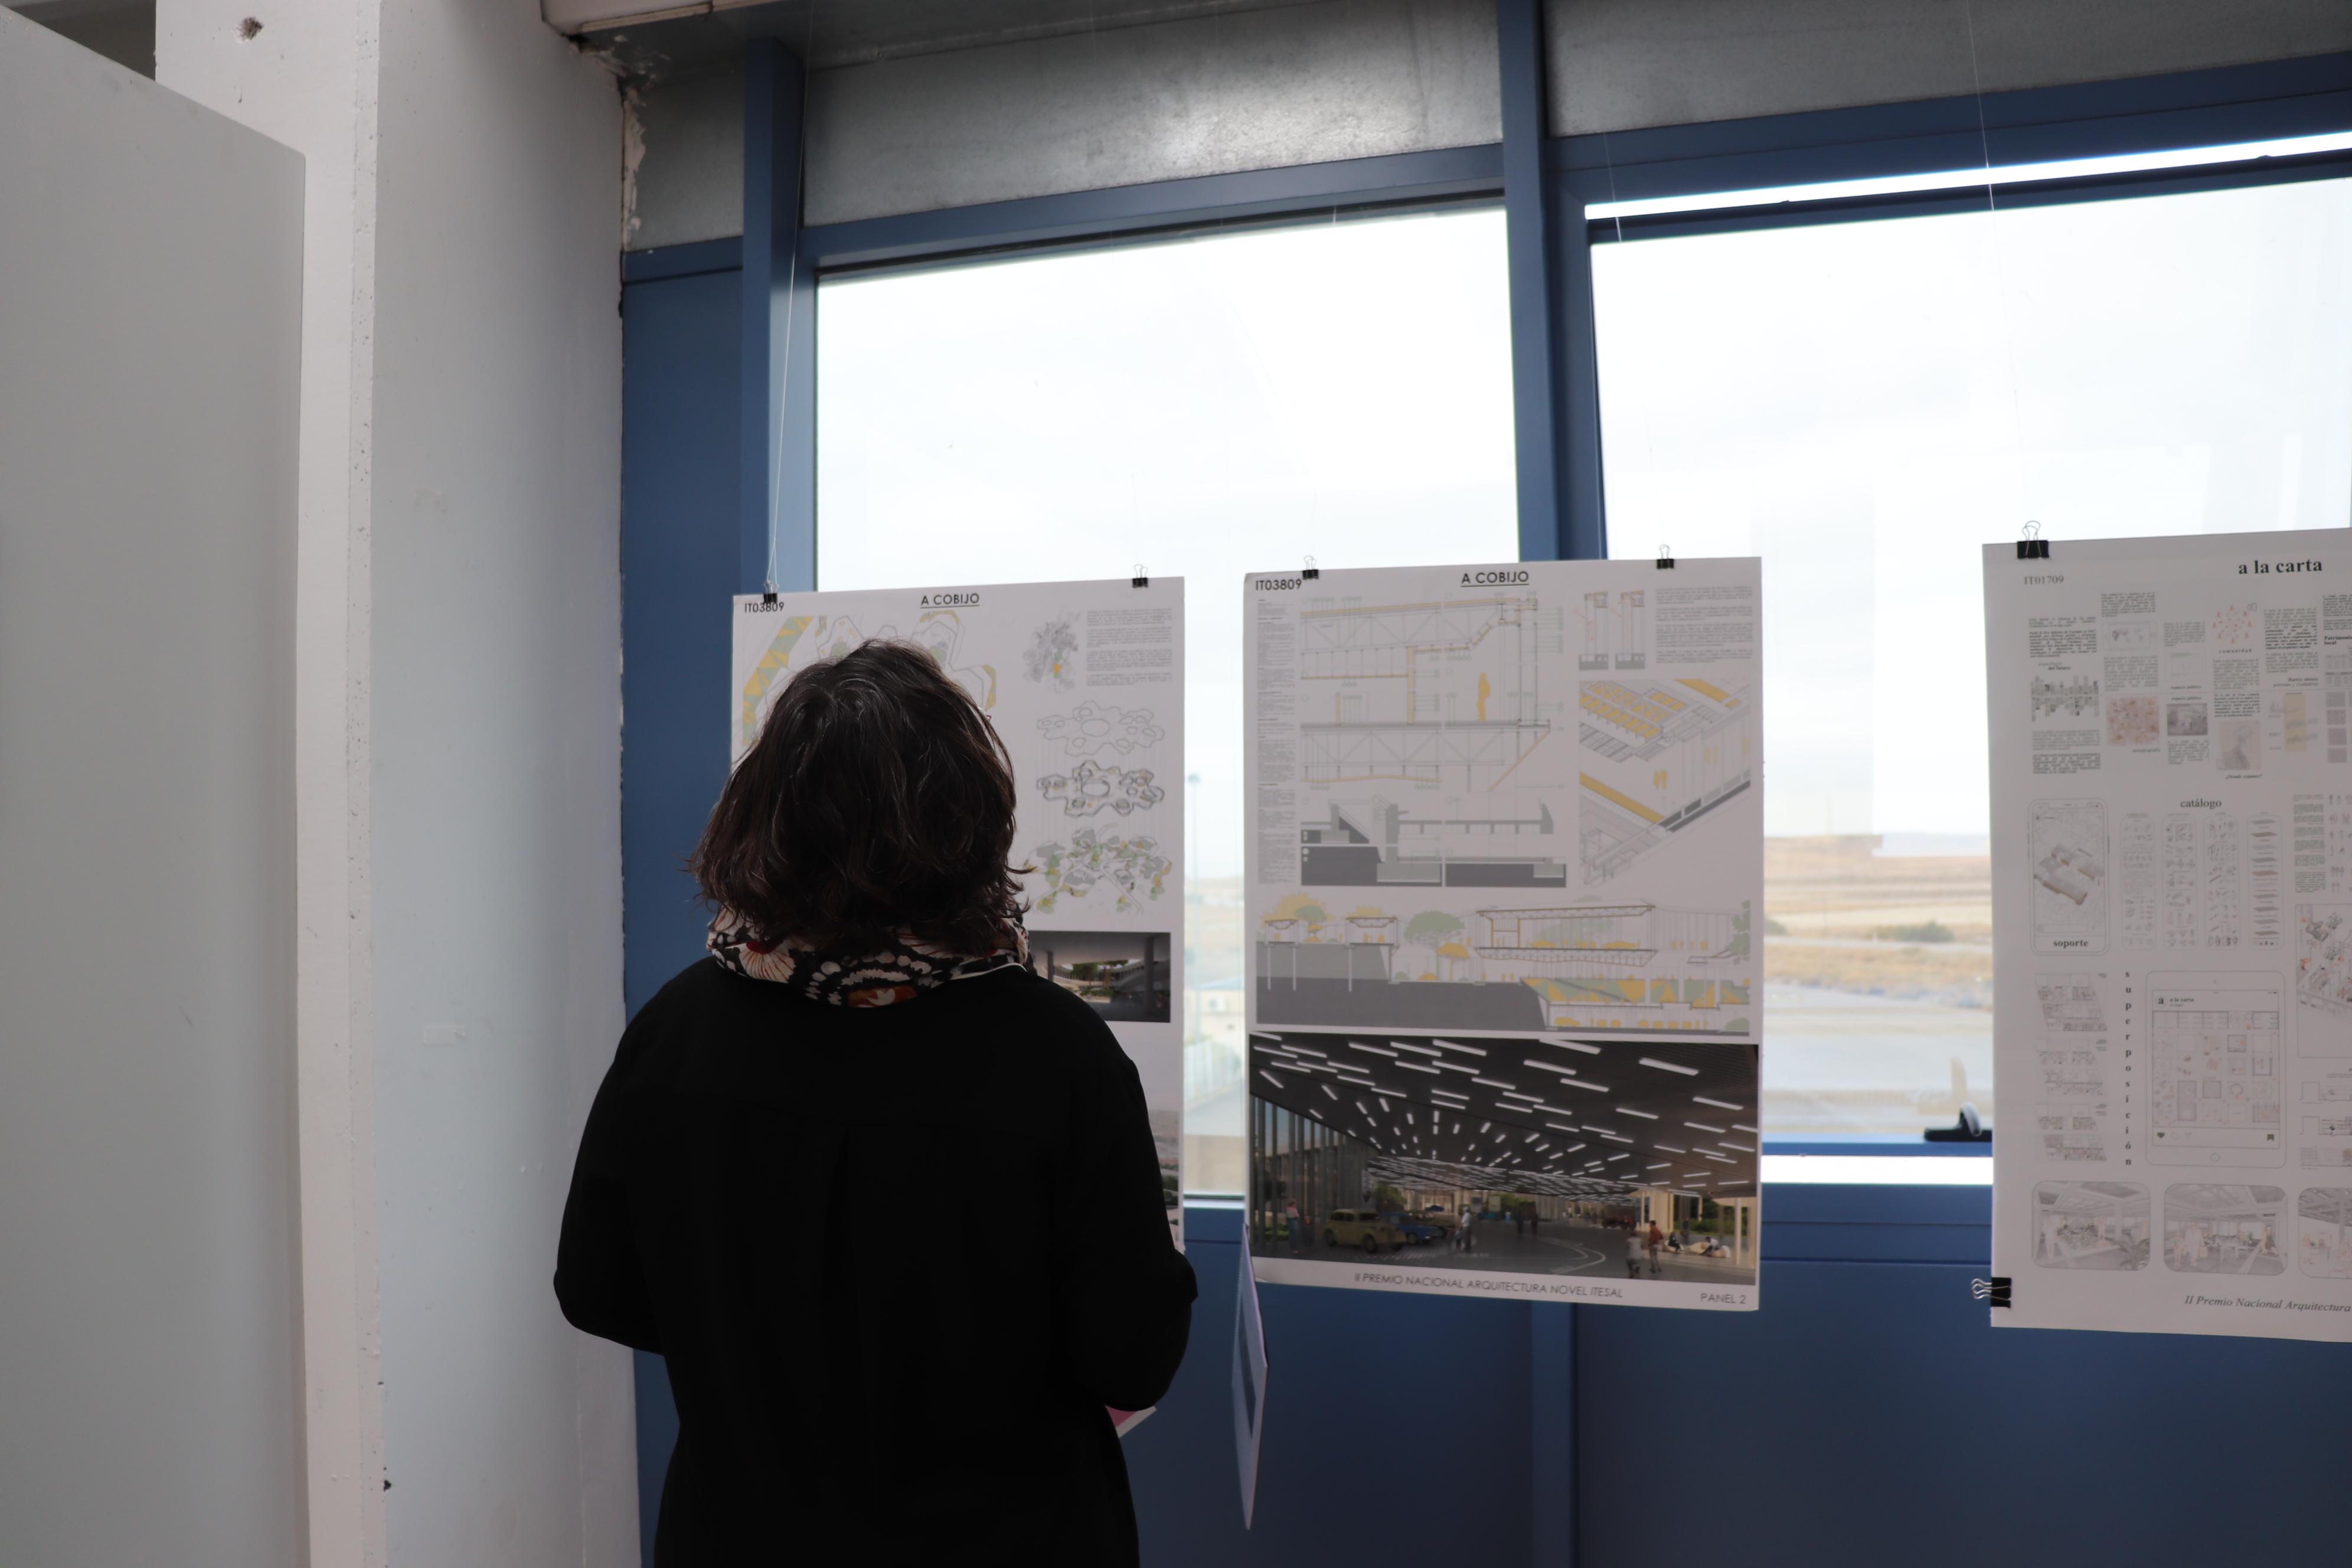 Galeria Comunicado oficial - Participantes y ganadores II Premio Nacional de Arquitectura Novel Itesal - 9